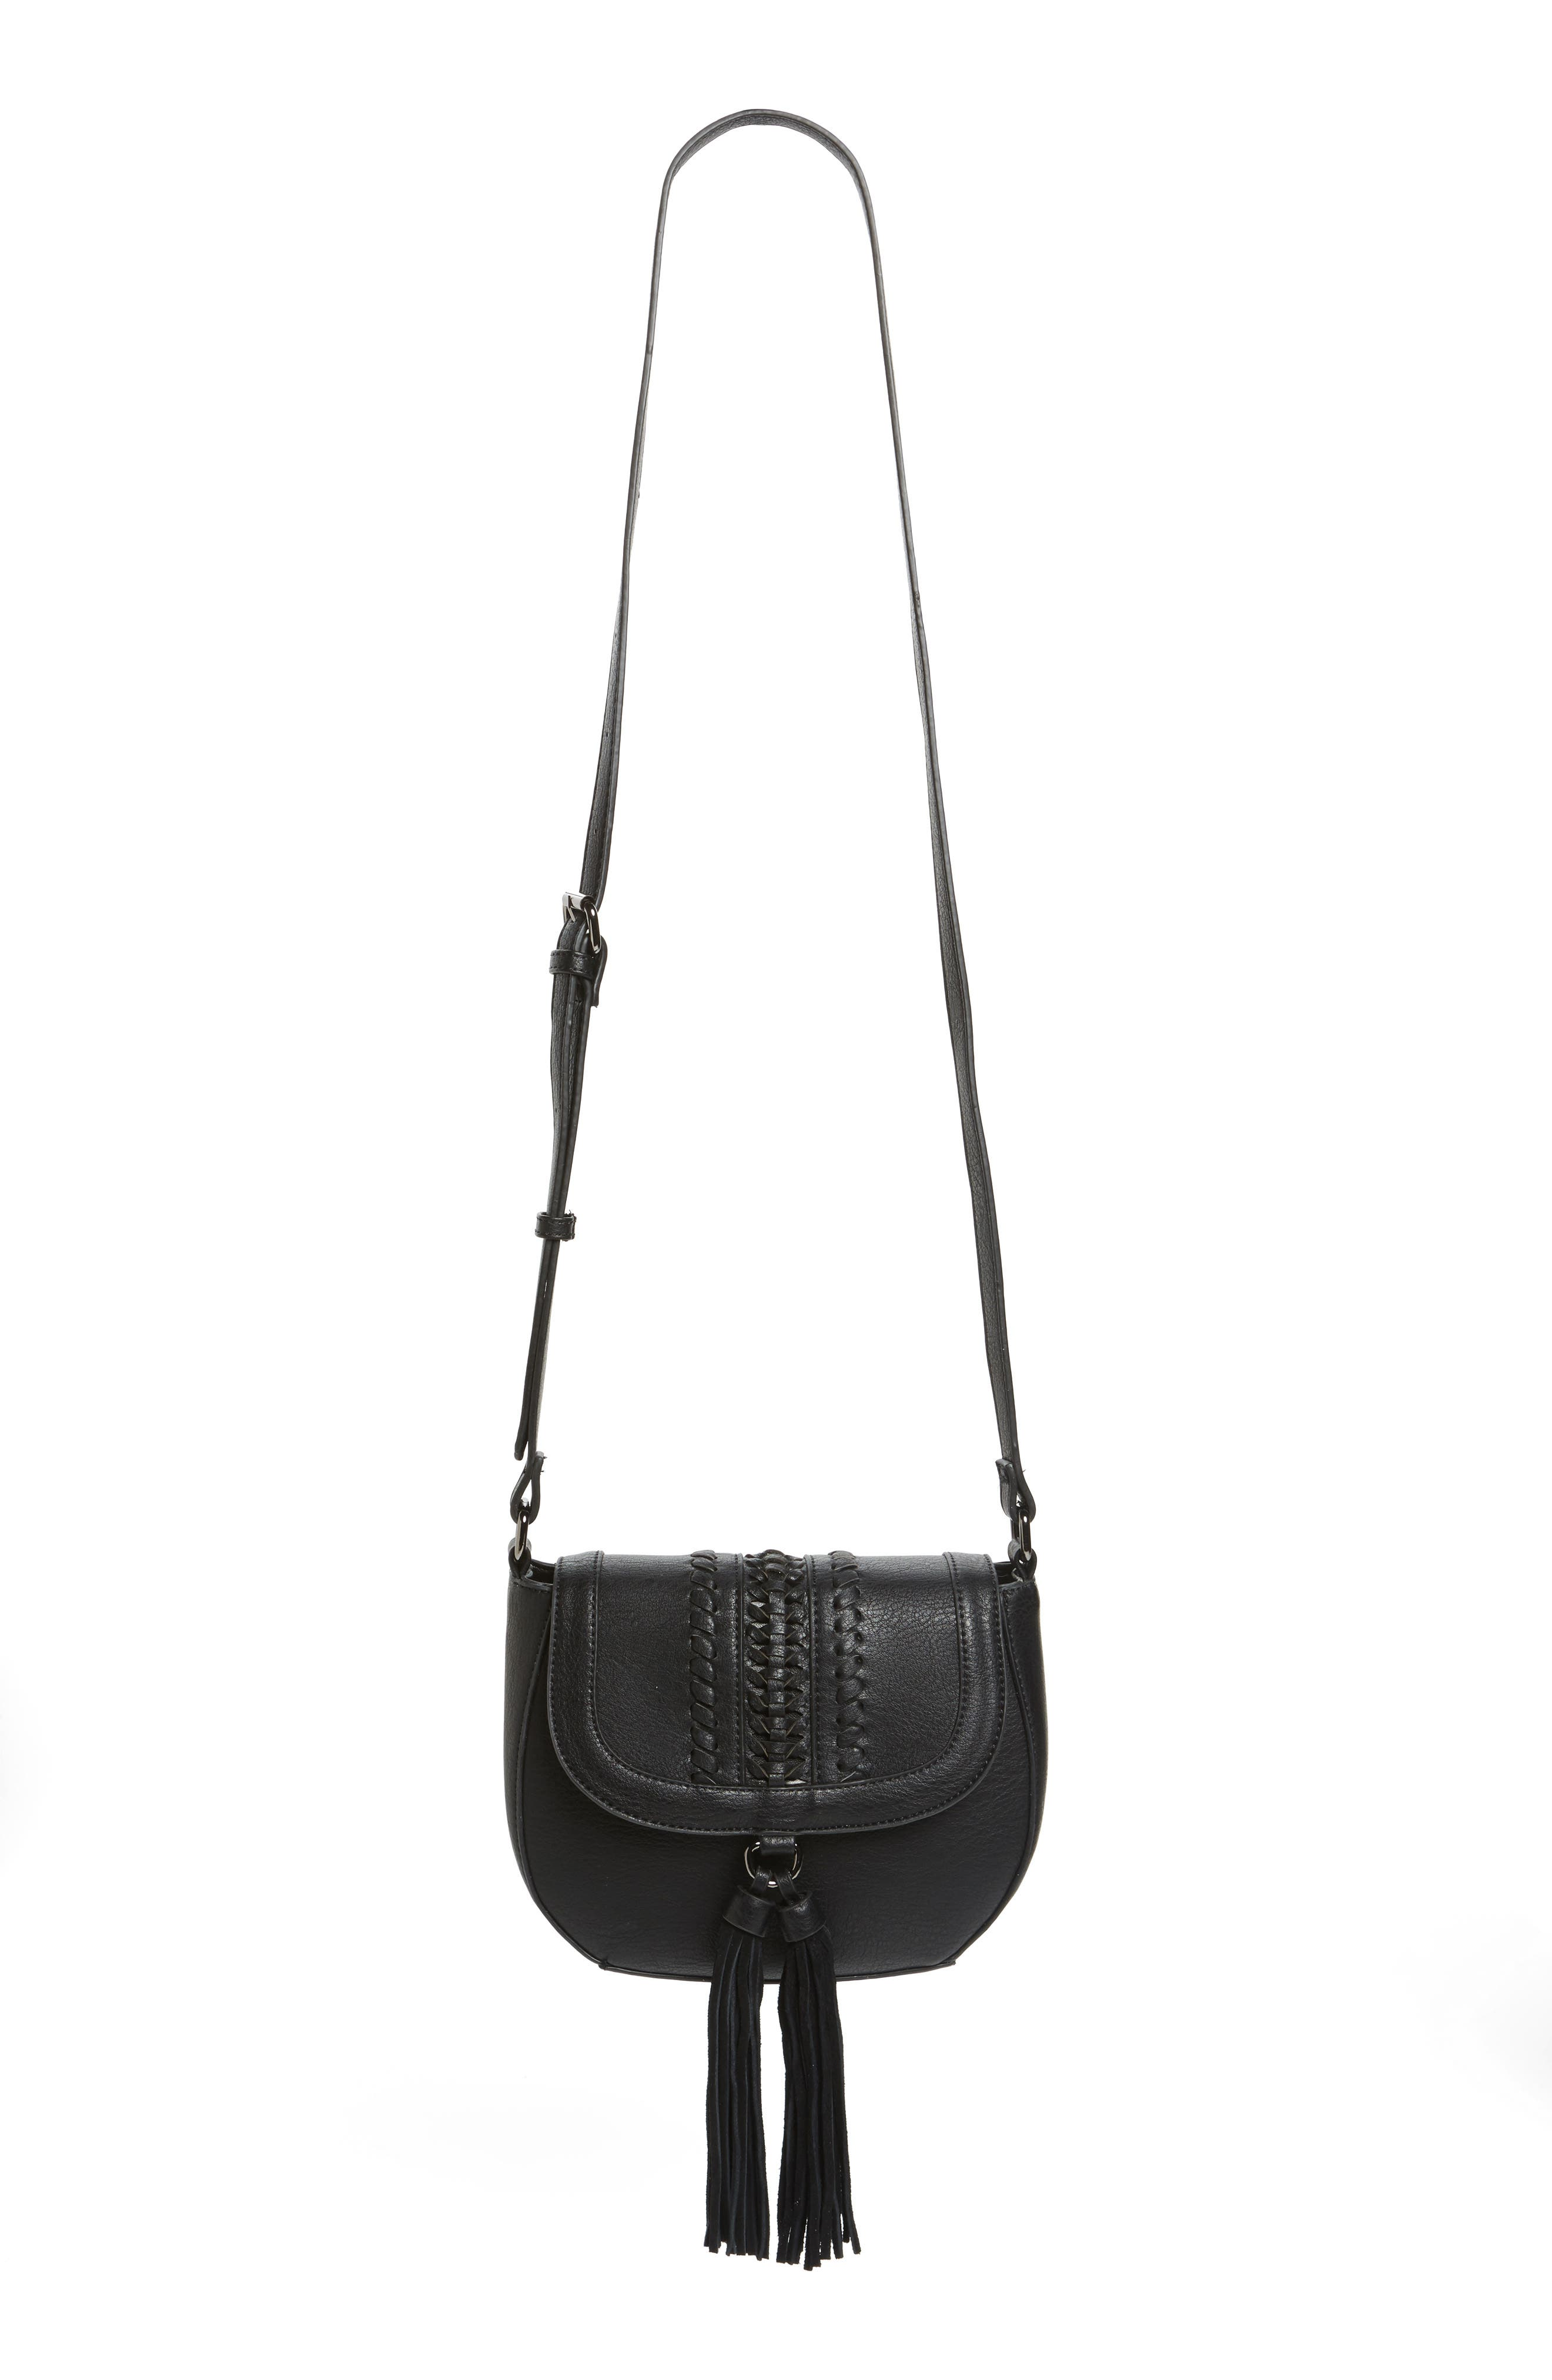 Phase 3 Tassel Crossbody Bag